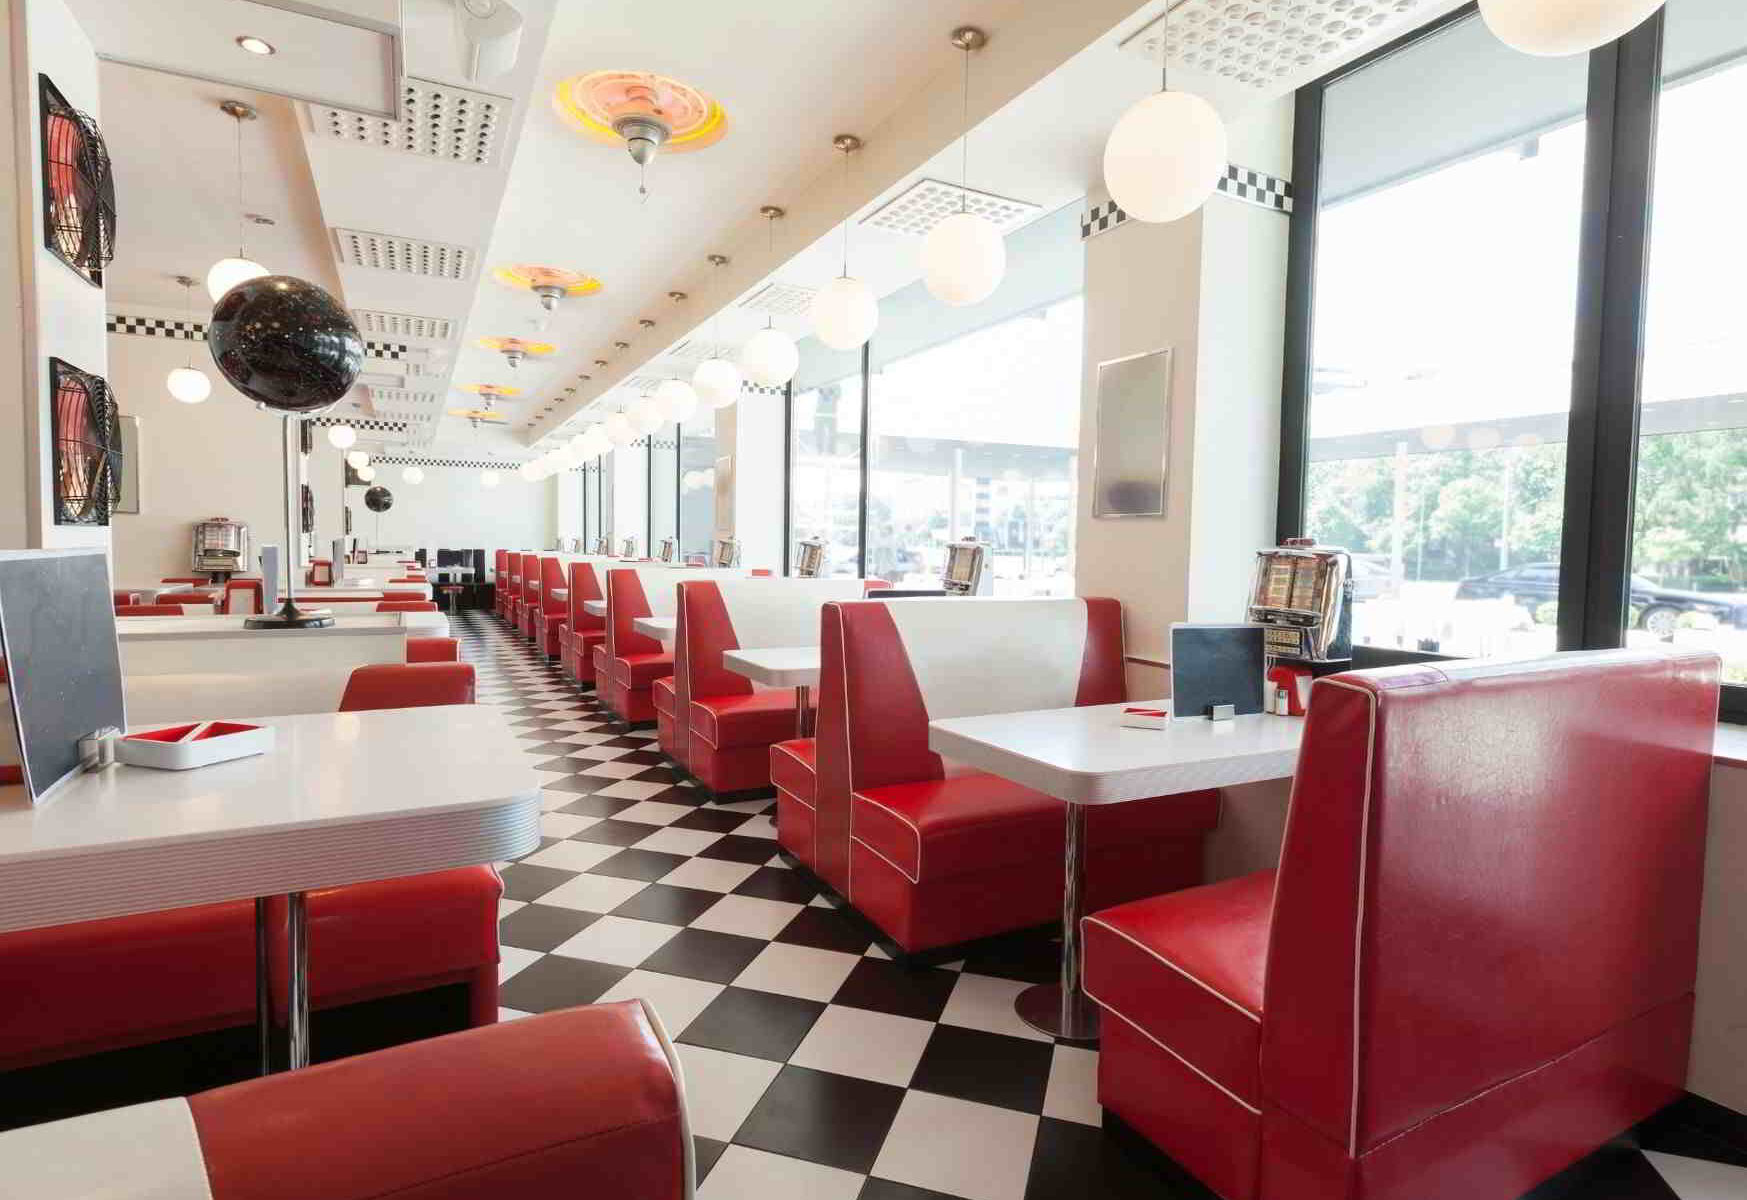 We are literally desperate': Restaurants struggle to find staff amid skills shortage